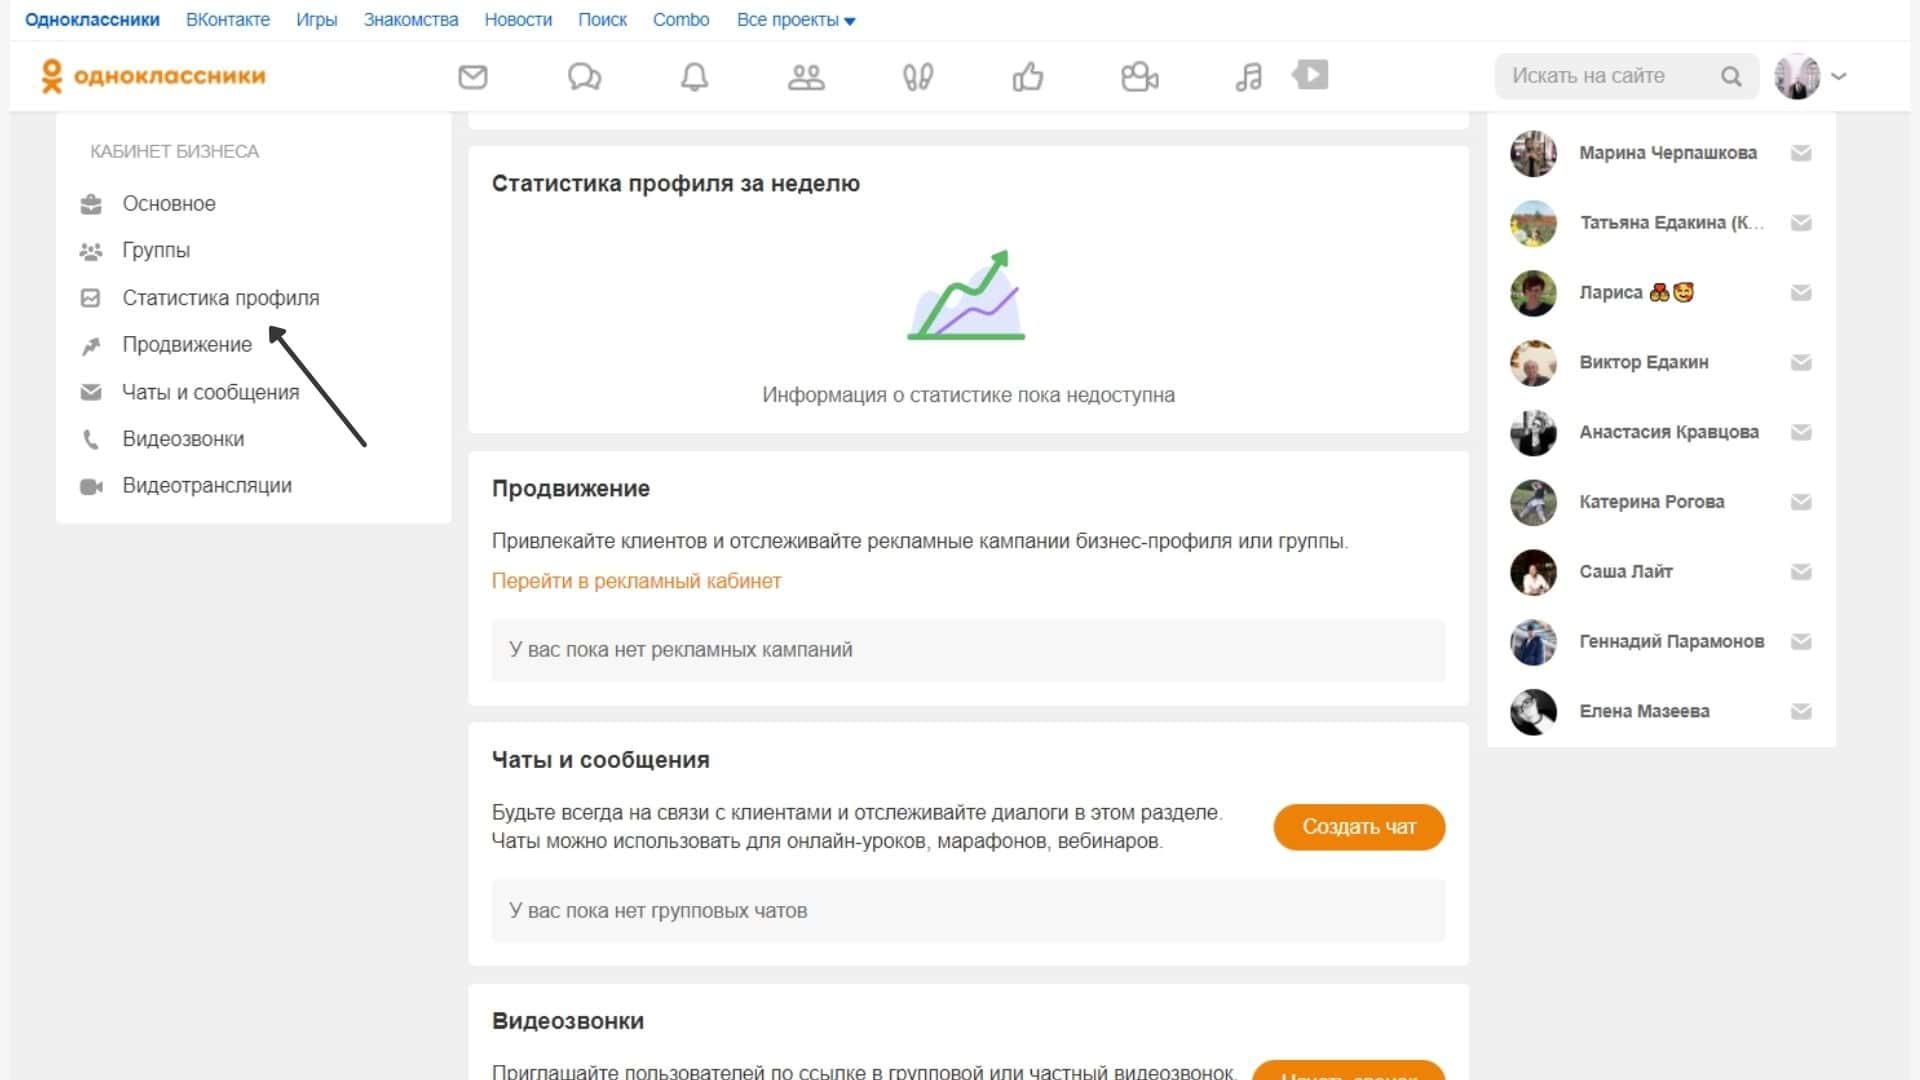 Статистика профиля в Одноклассниках